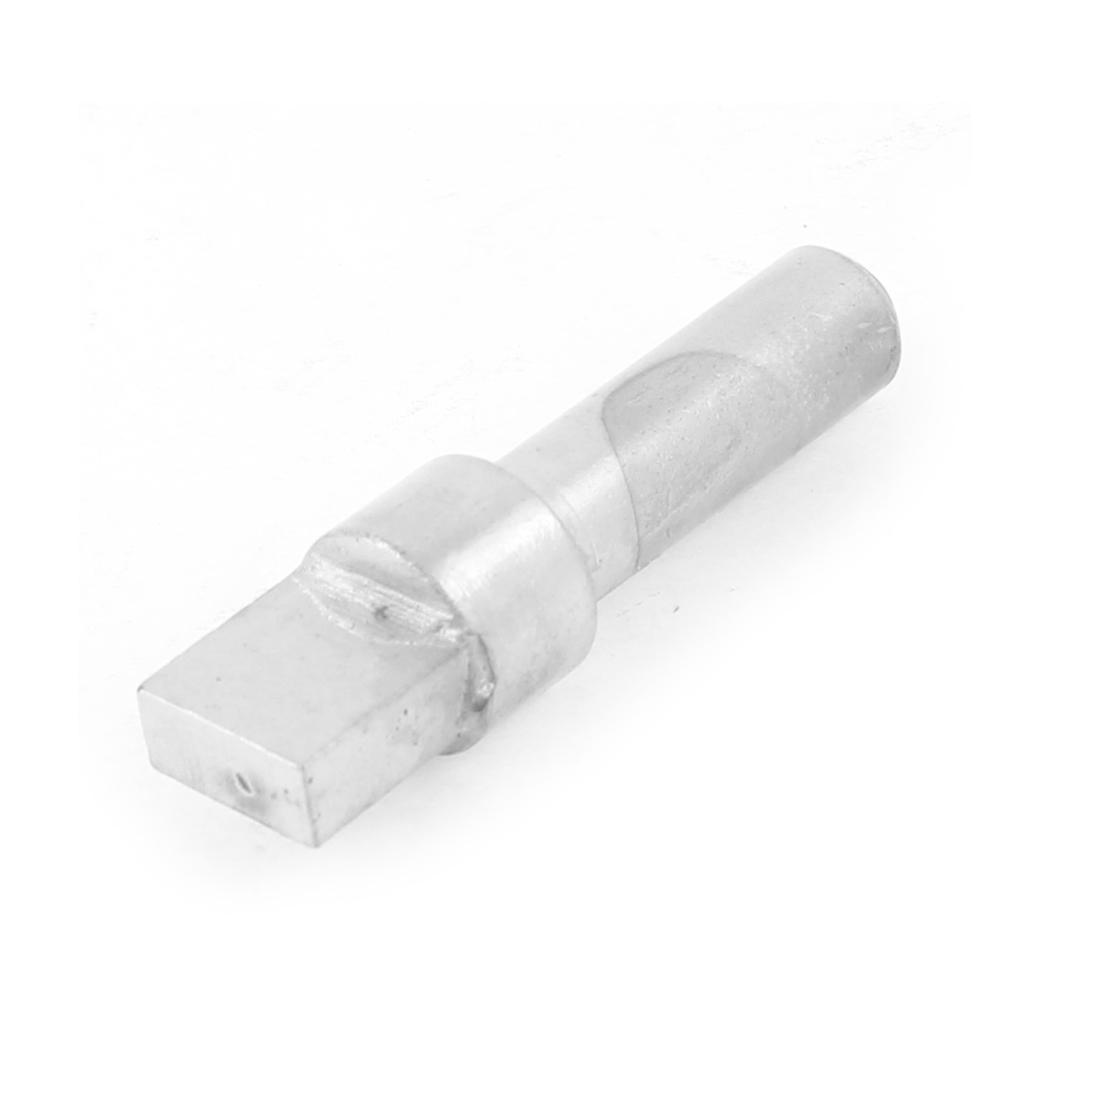 Flat Point Head 10mm Shank Grinding Wheel Diamond Dresser Pen Tool